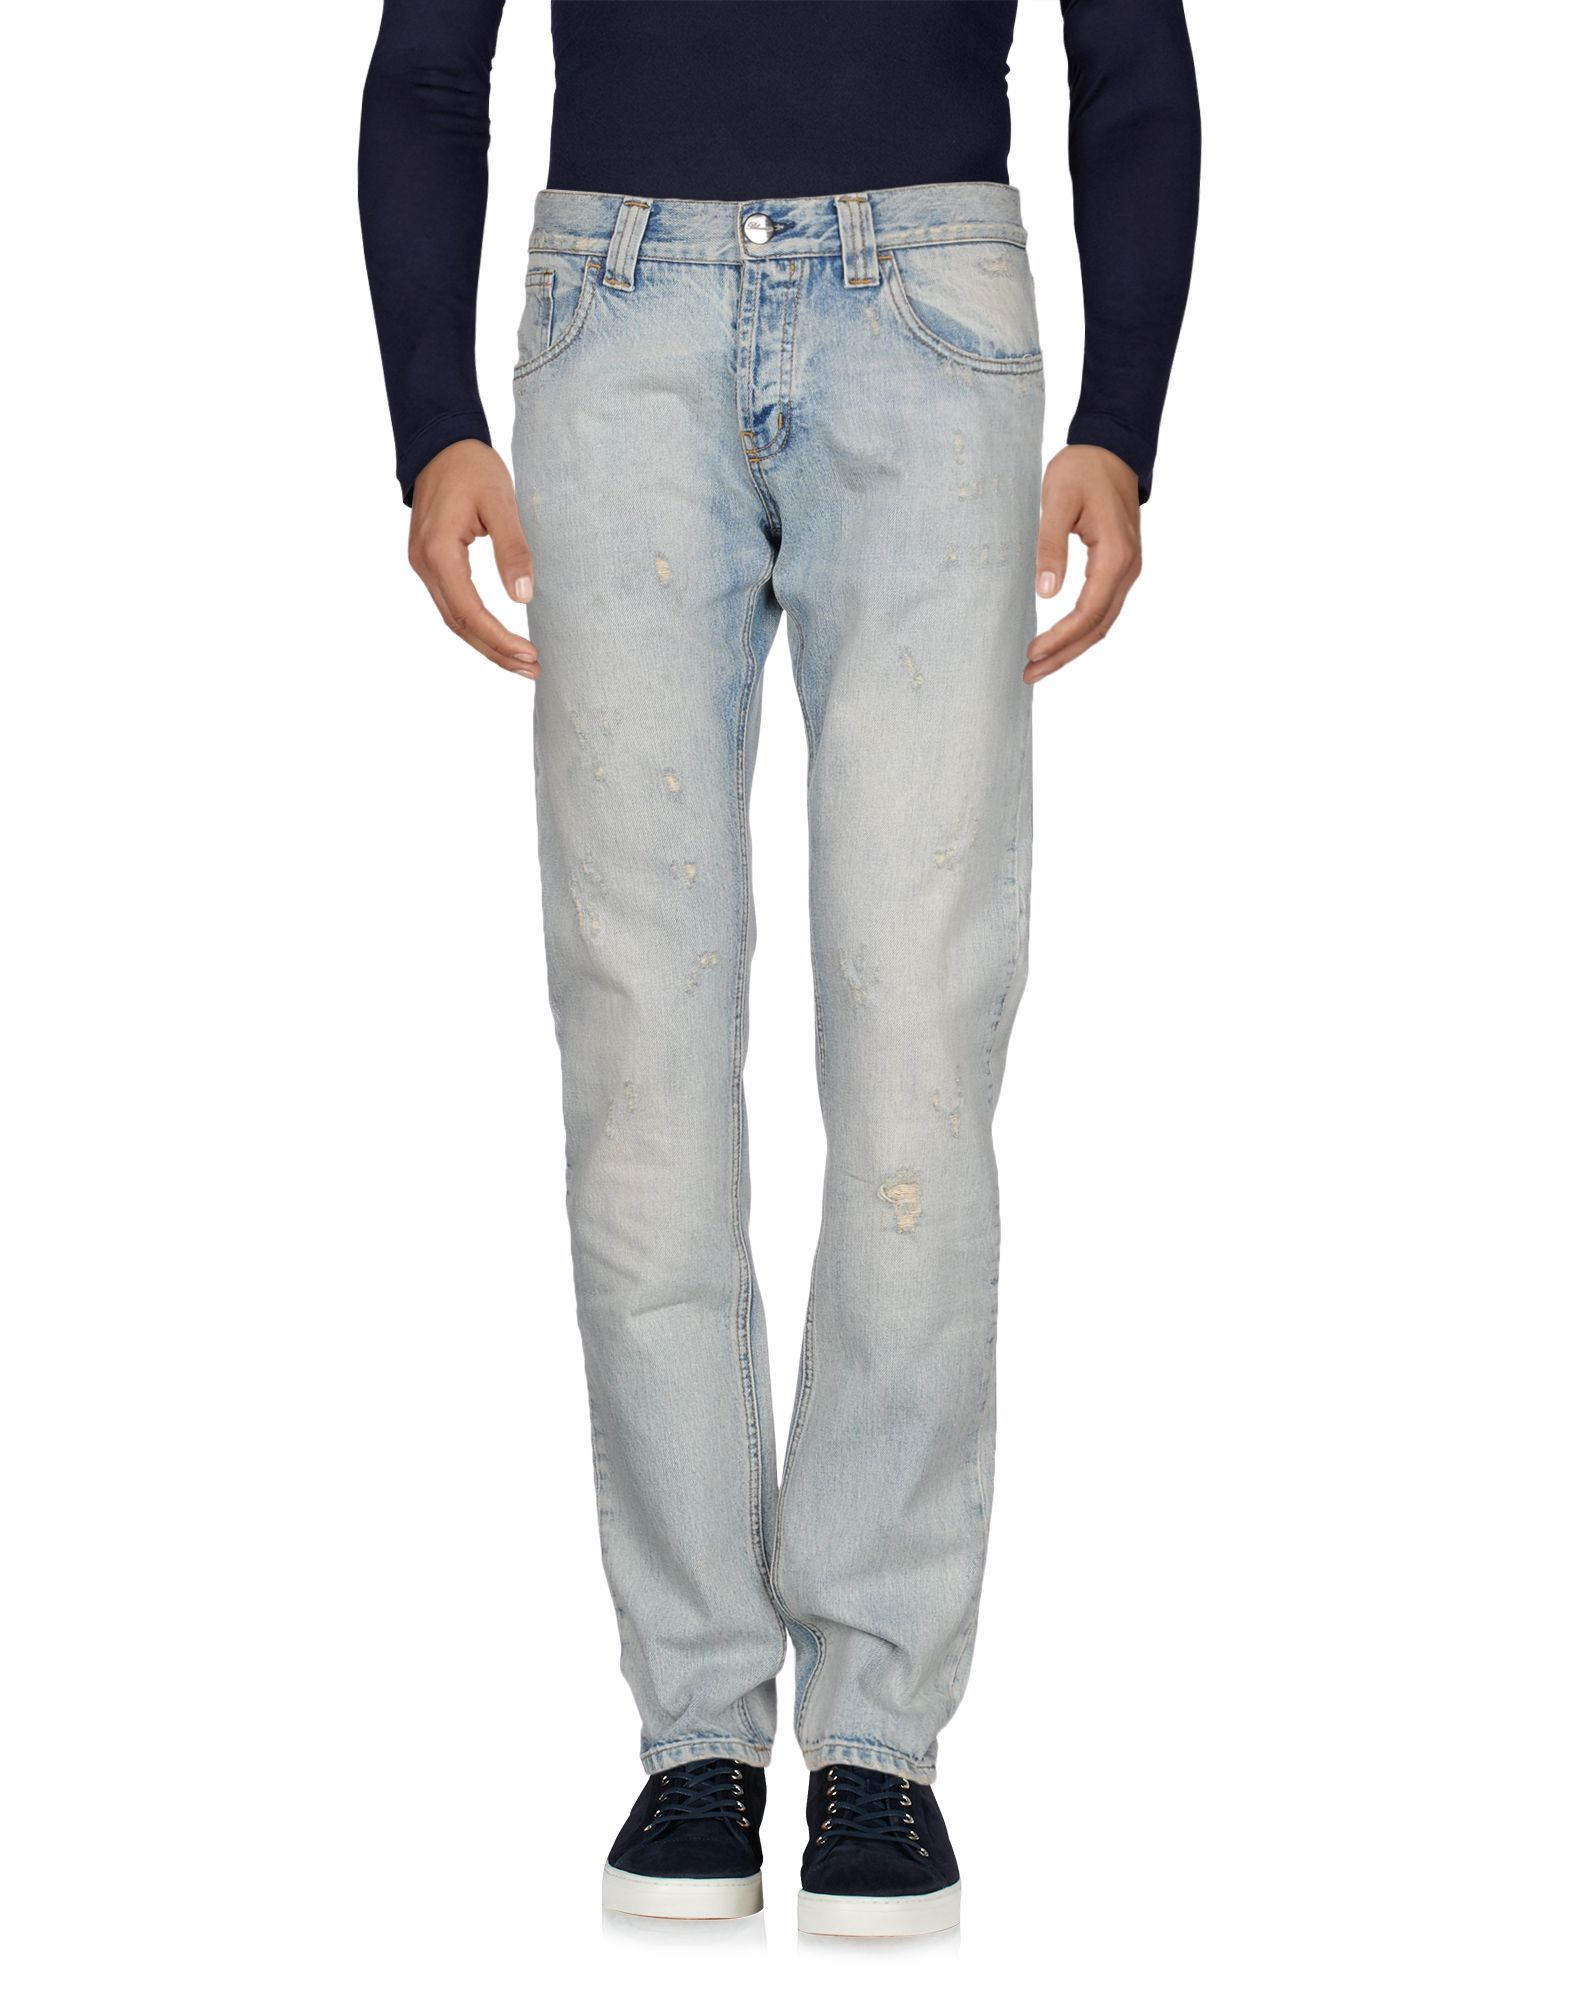 BLUMARINE UOMO Джинсовые брюки blumarine uomo pубашка